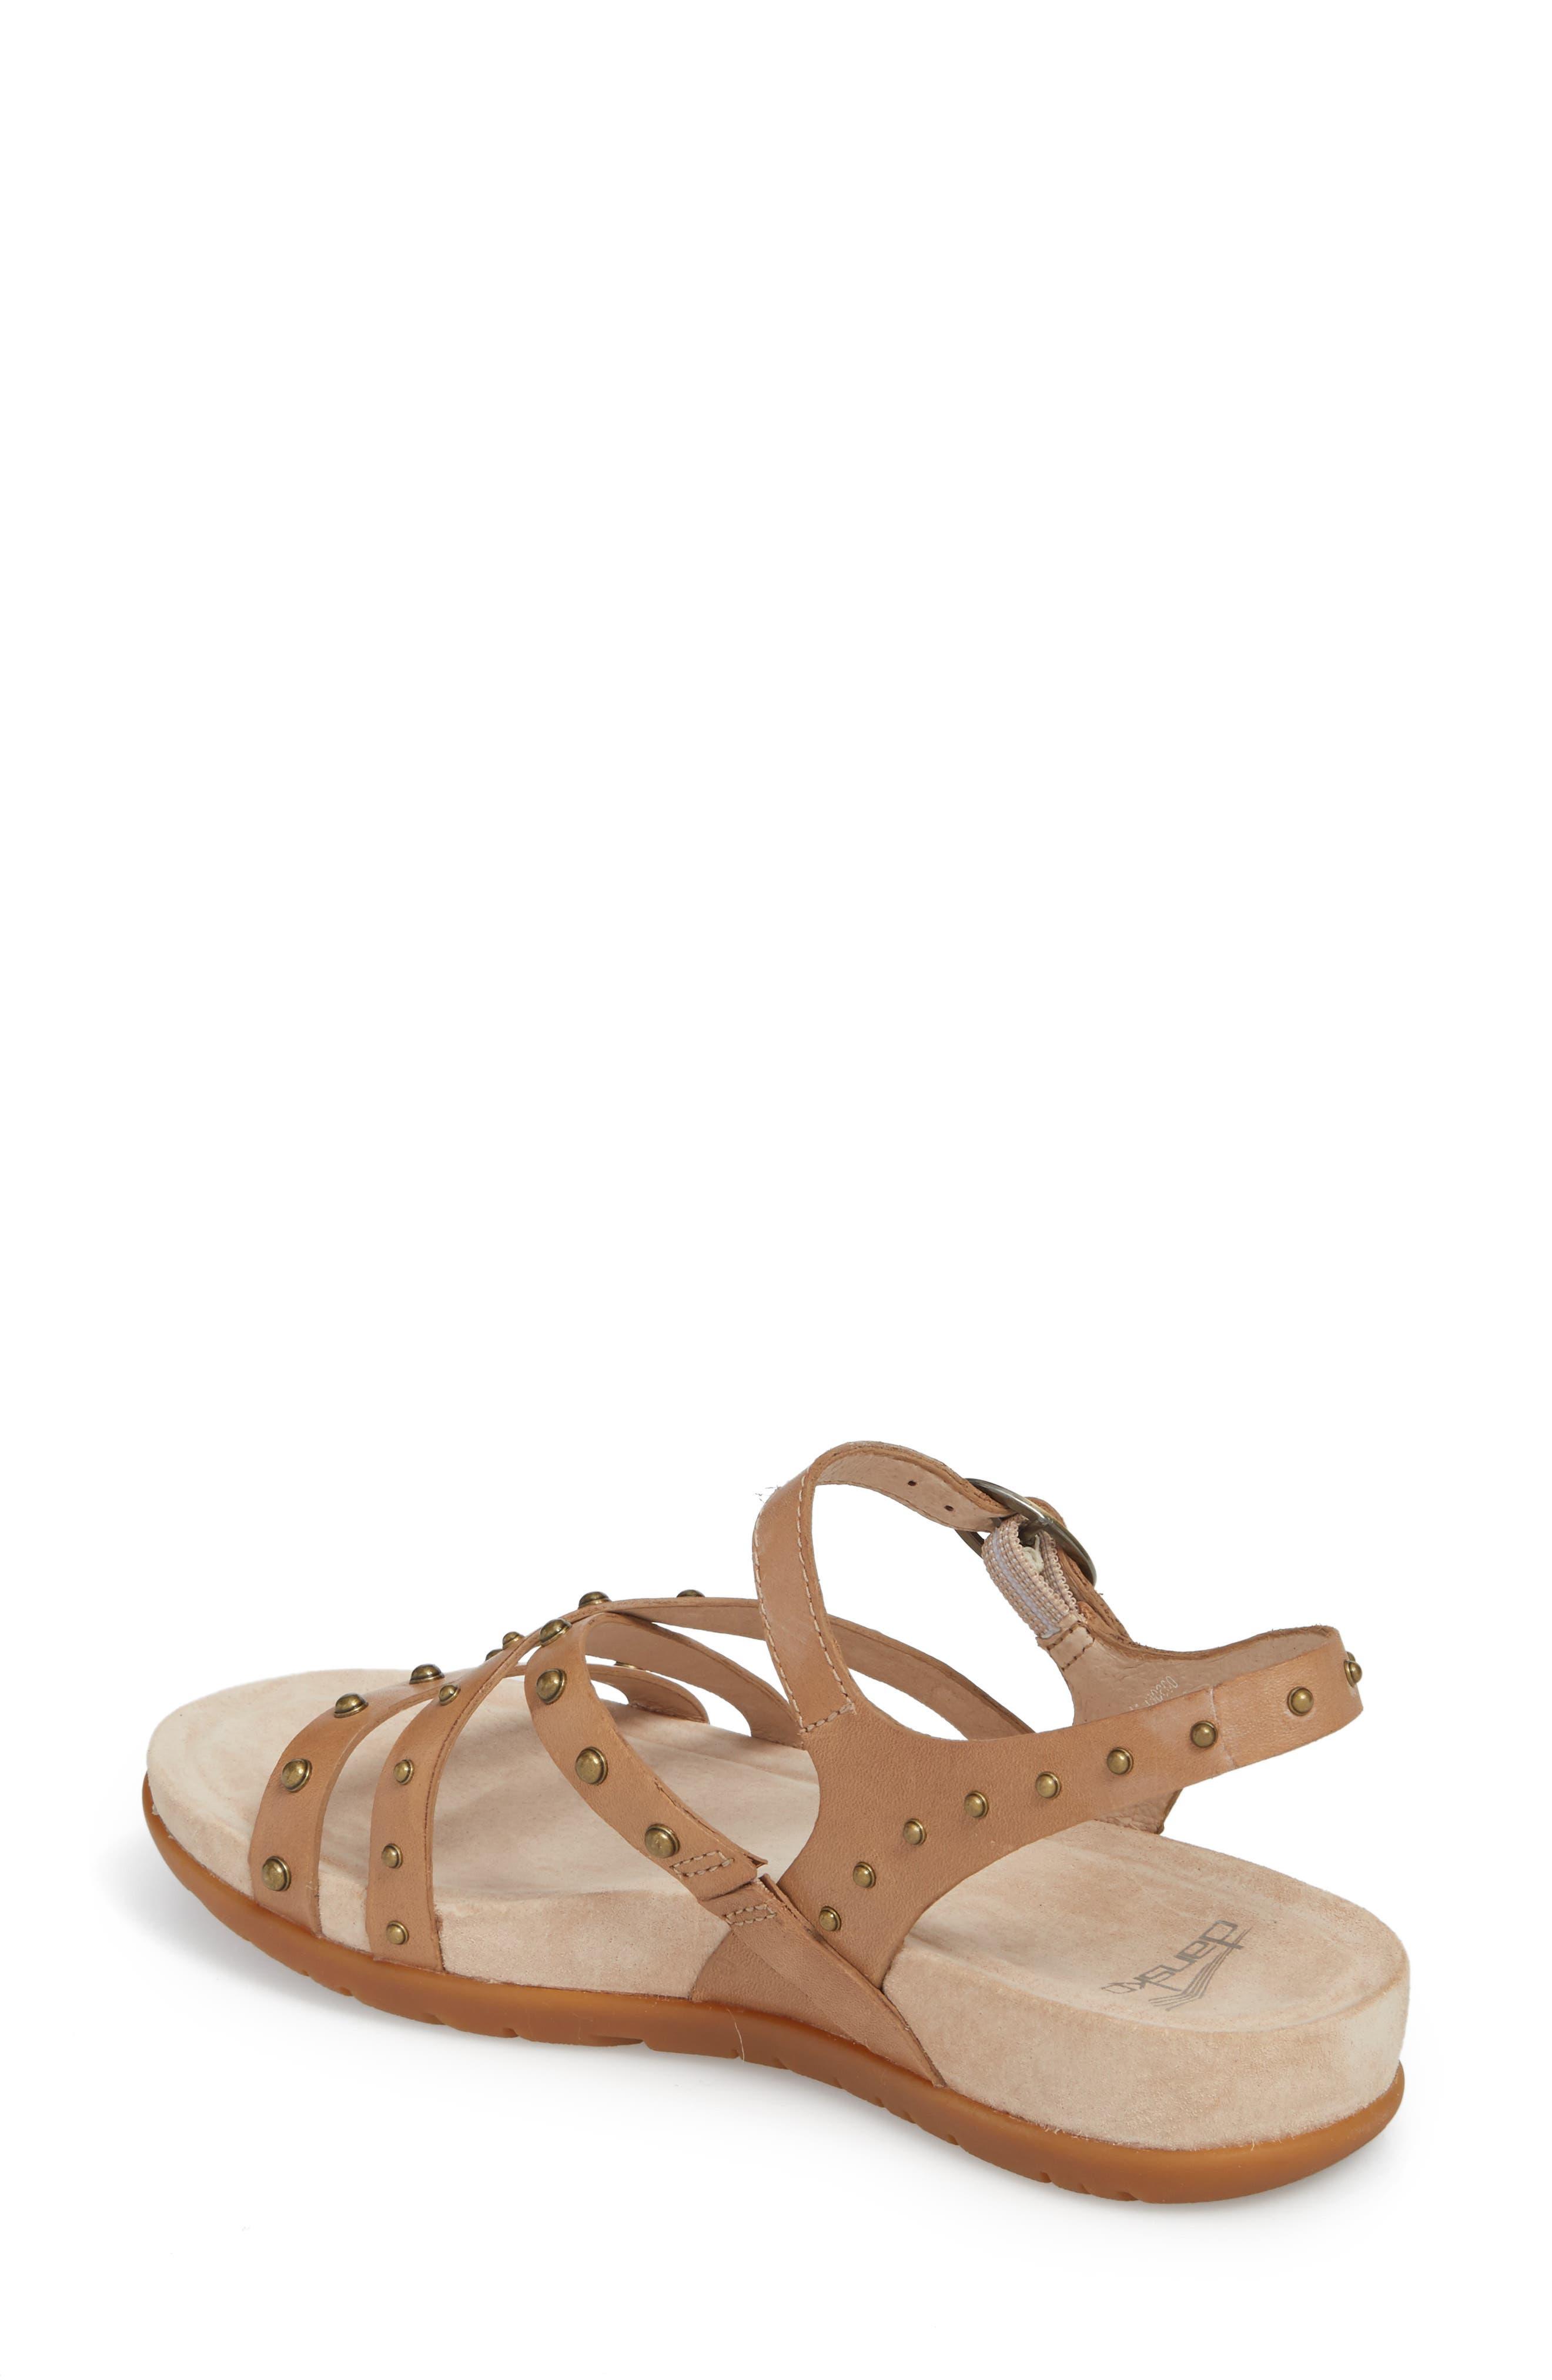 Brigitte Studded Strappy Sandal,                             Alternate thumbnail 2, color,                             Sand Leather